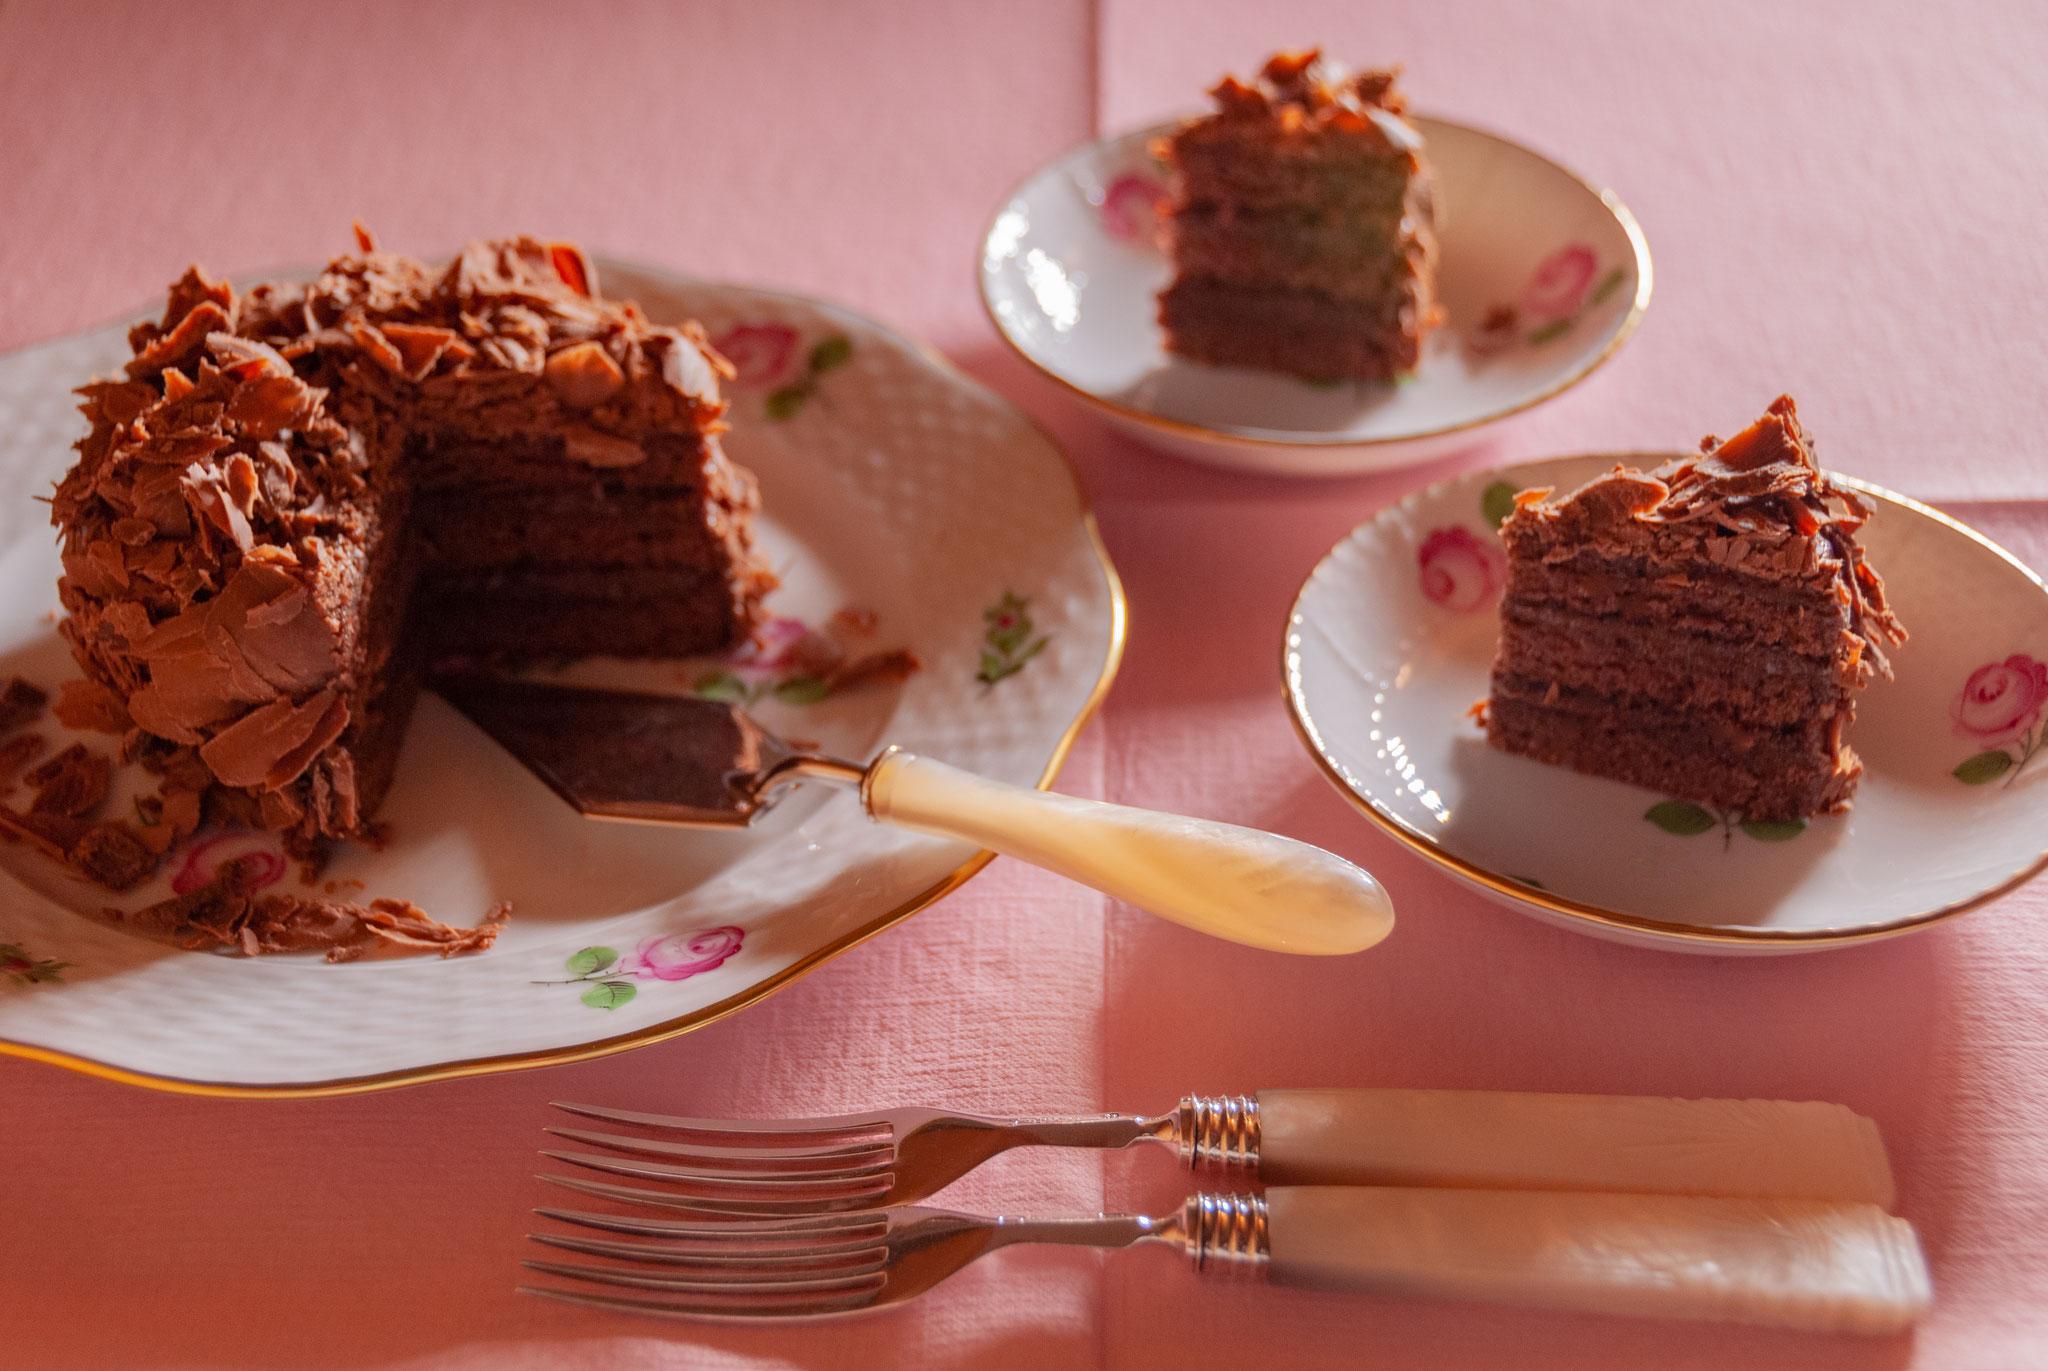 Chocolate cake, φ3.5 inches (φ9 cm), Fleur*Fleur*